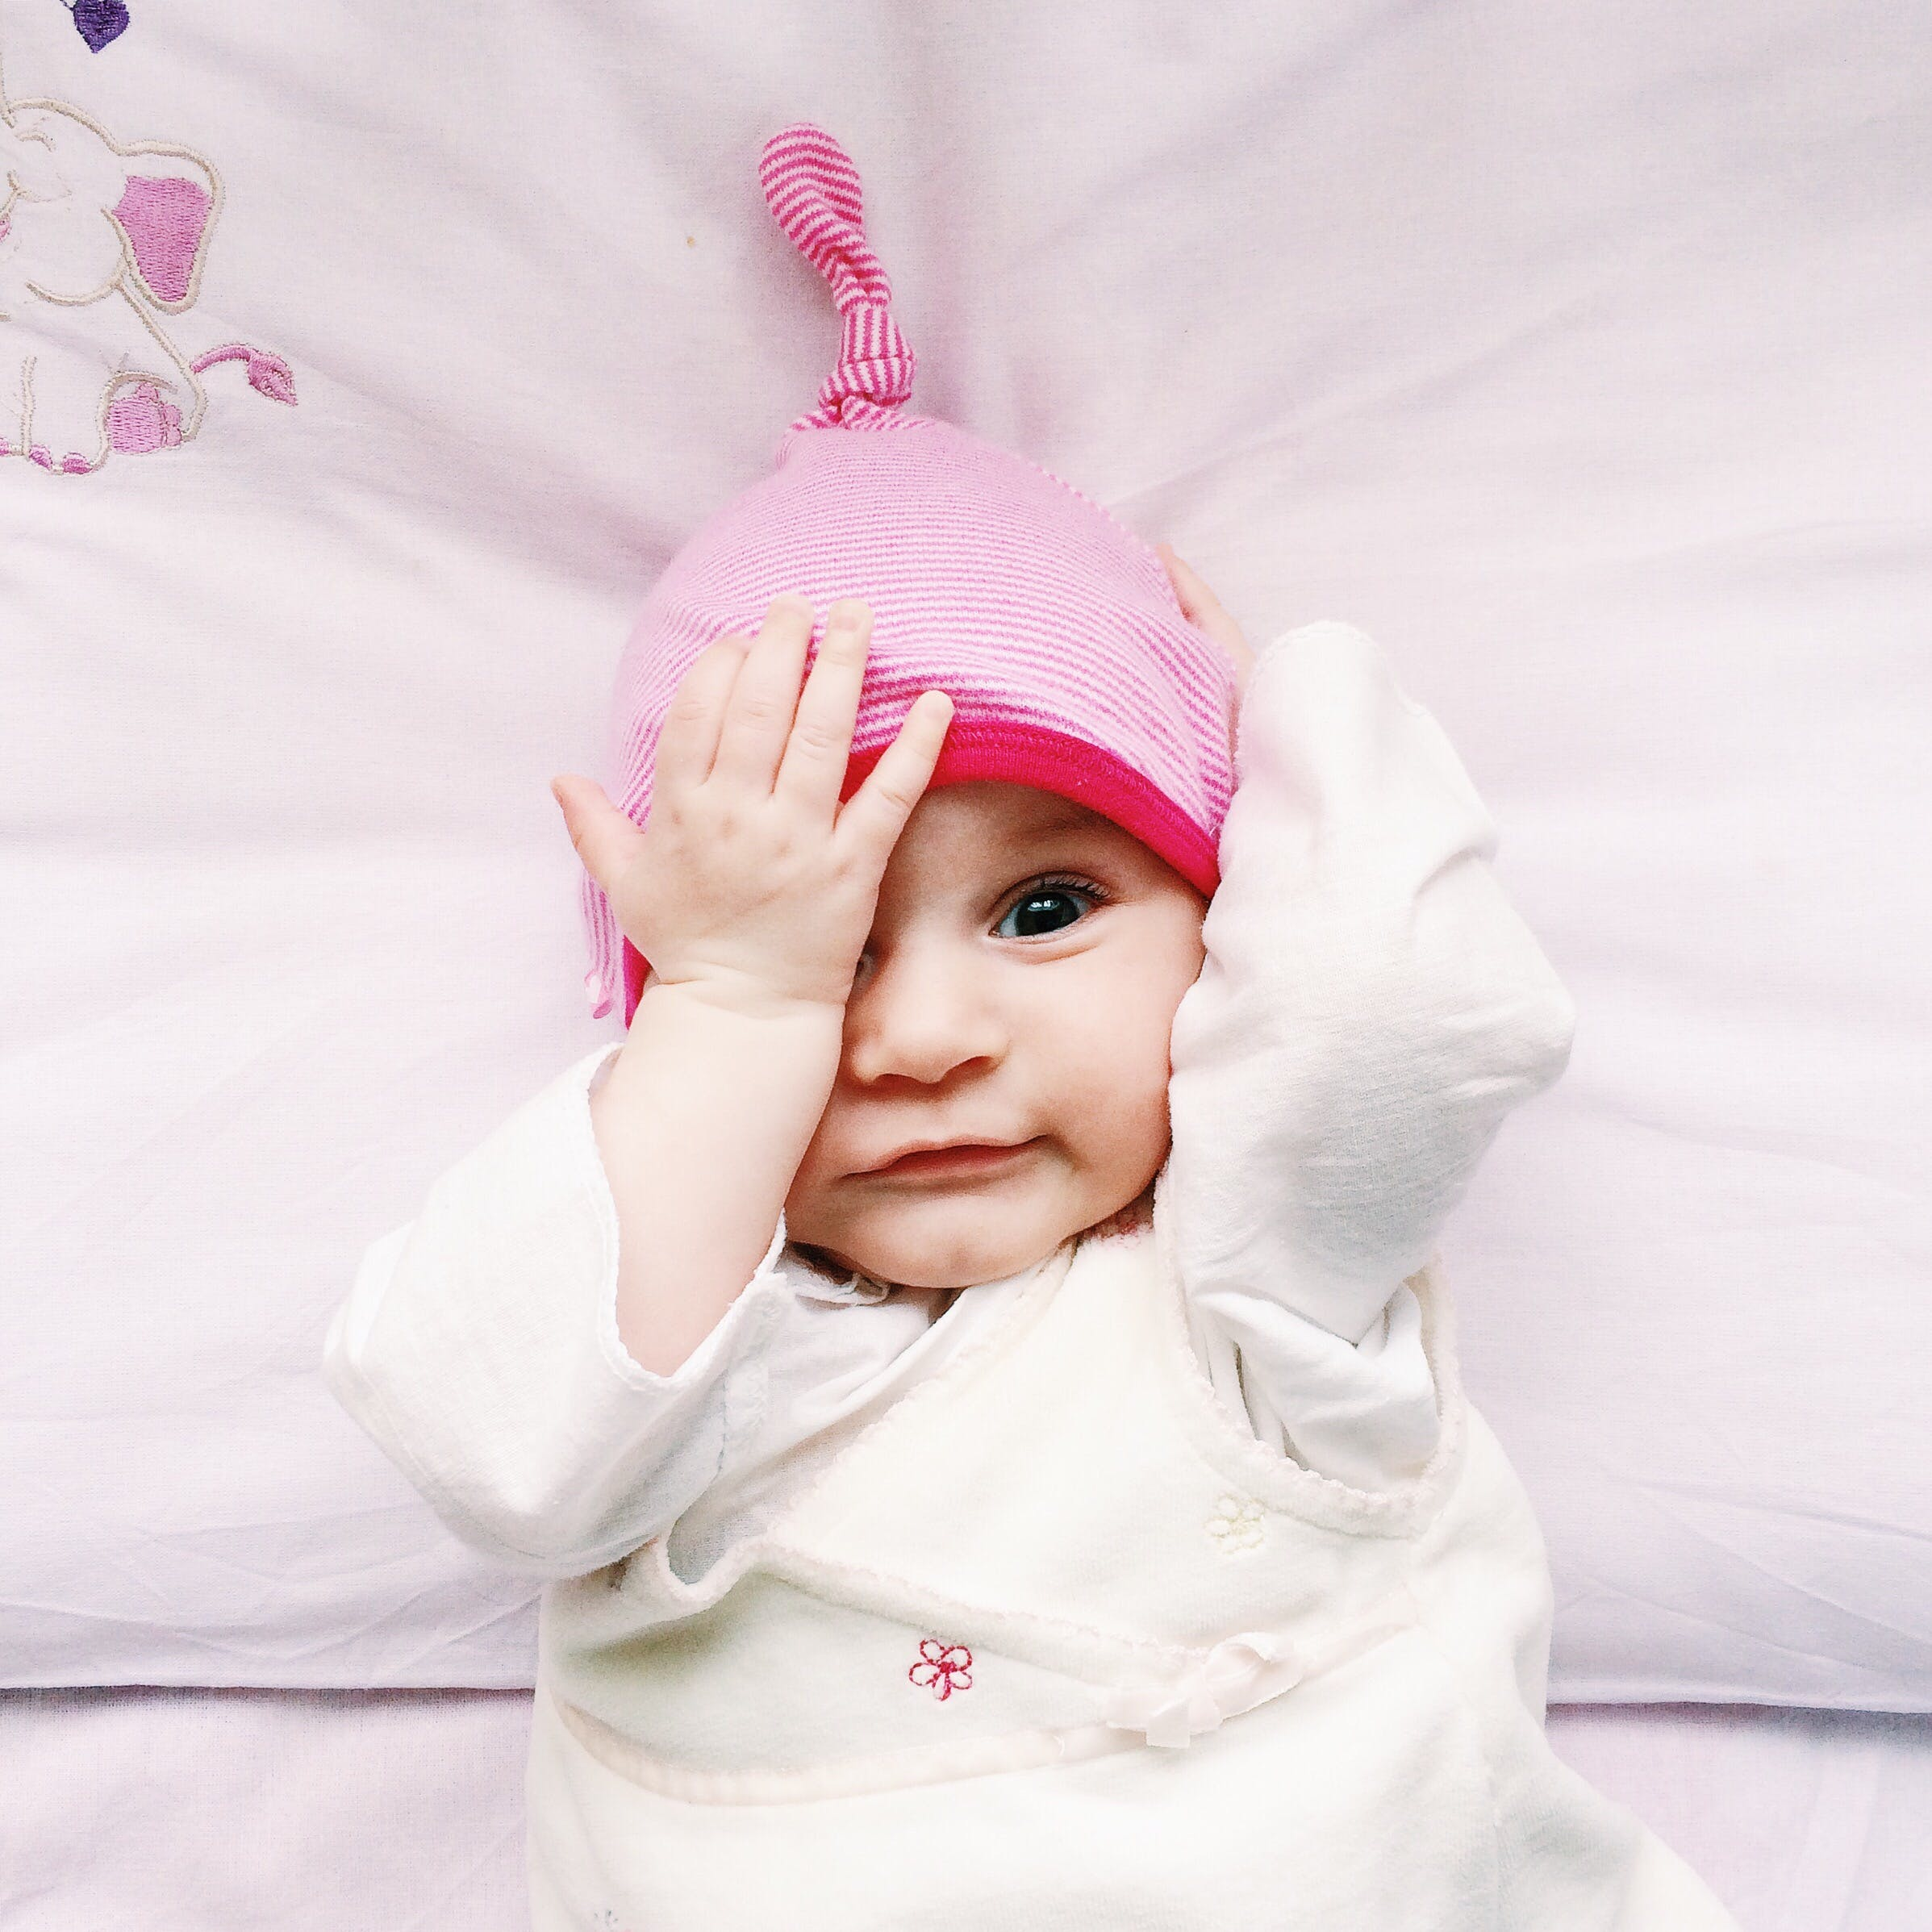 los angeles baby names 4